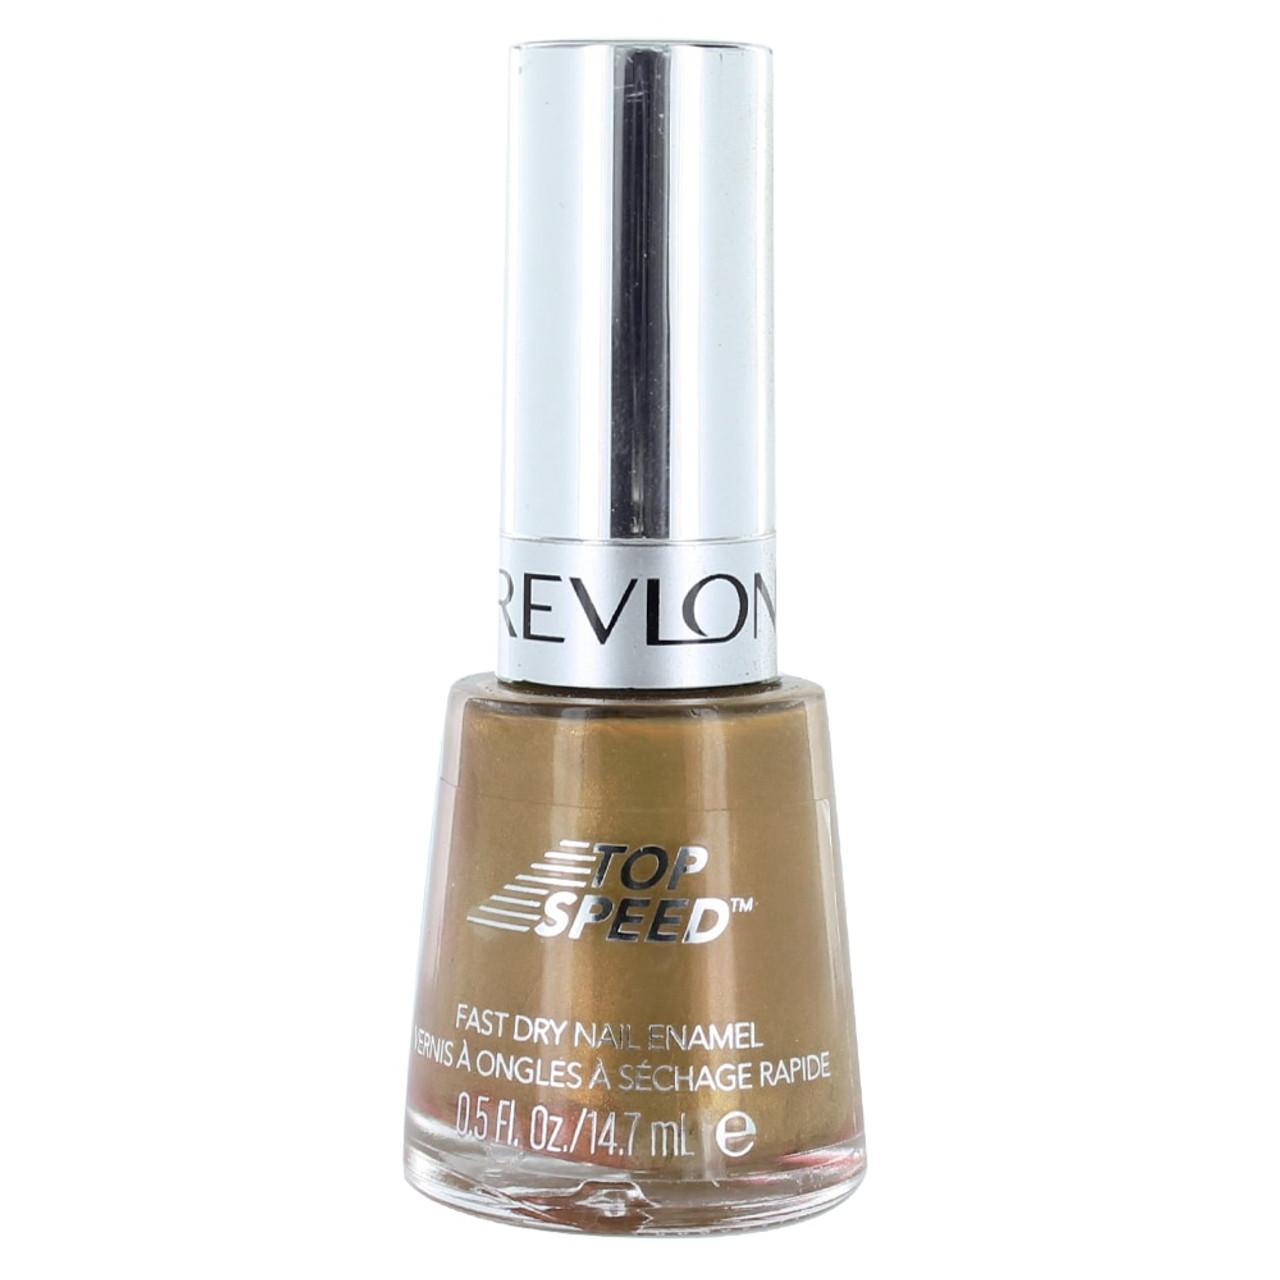 Revlon Top Speed Fast Dry Nail Enamel 5oz Buymebeauty Com